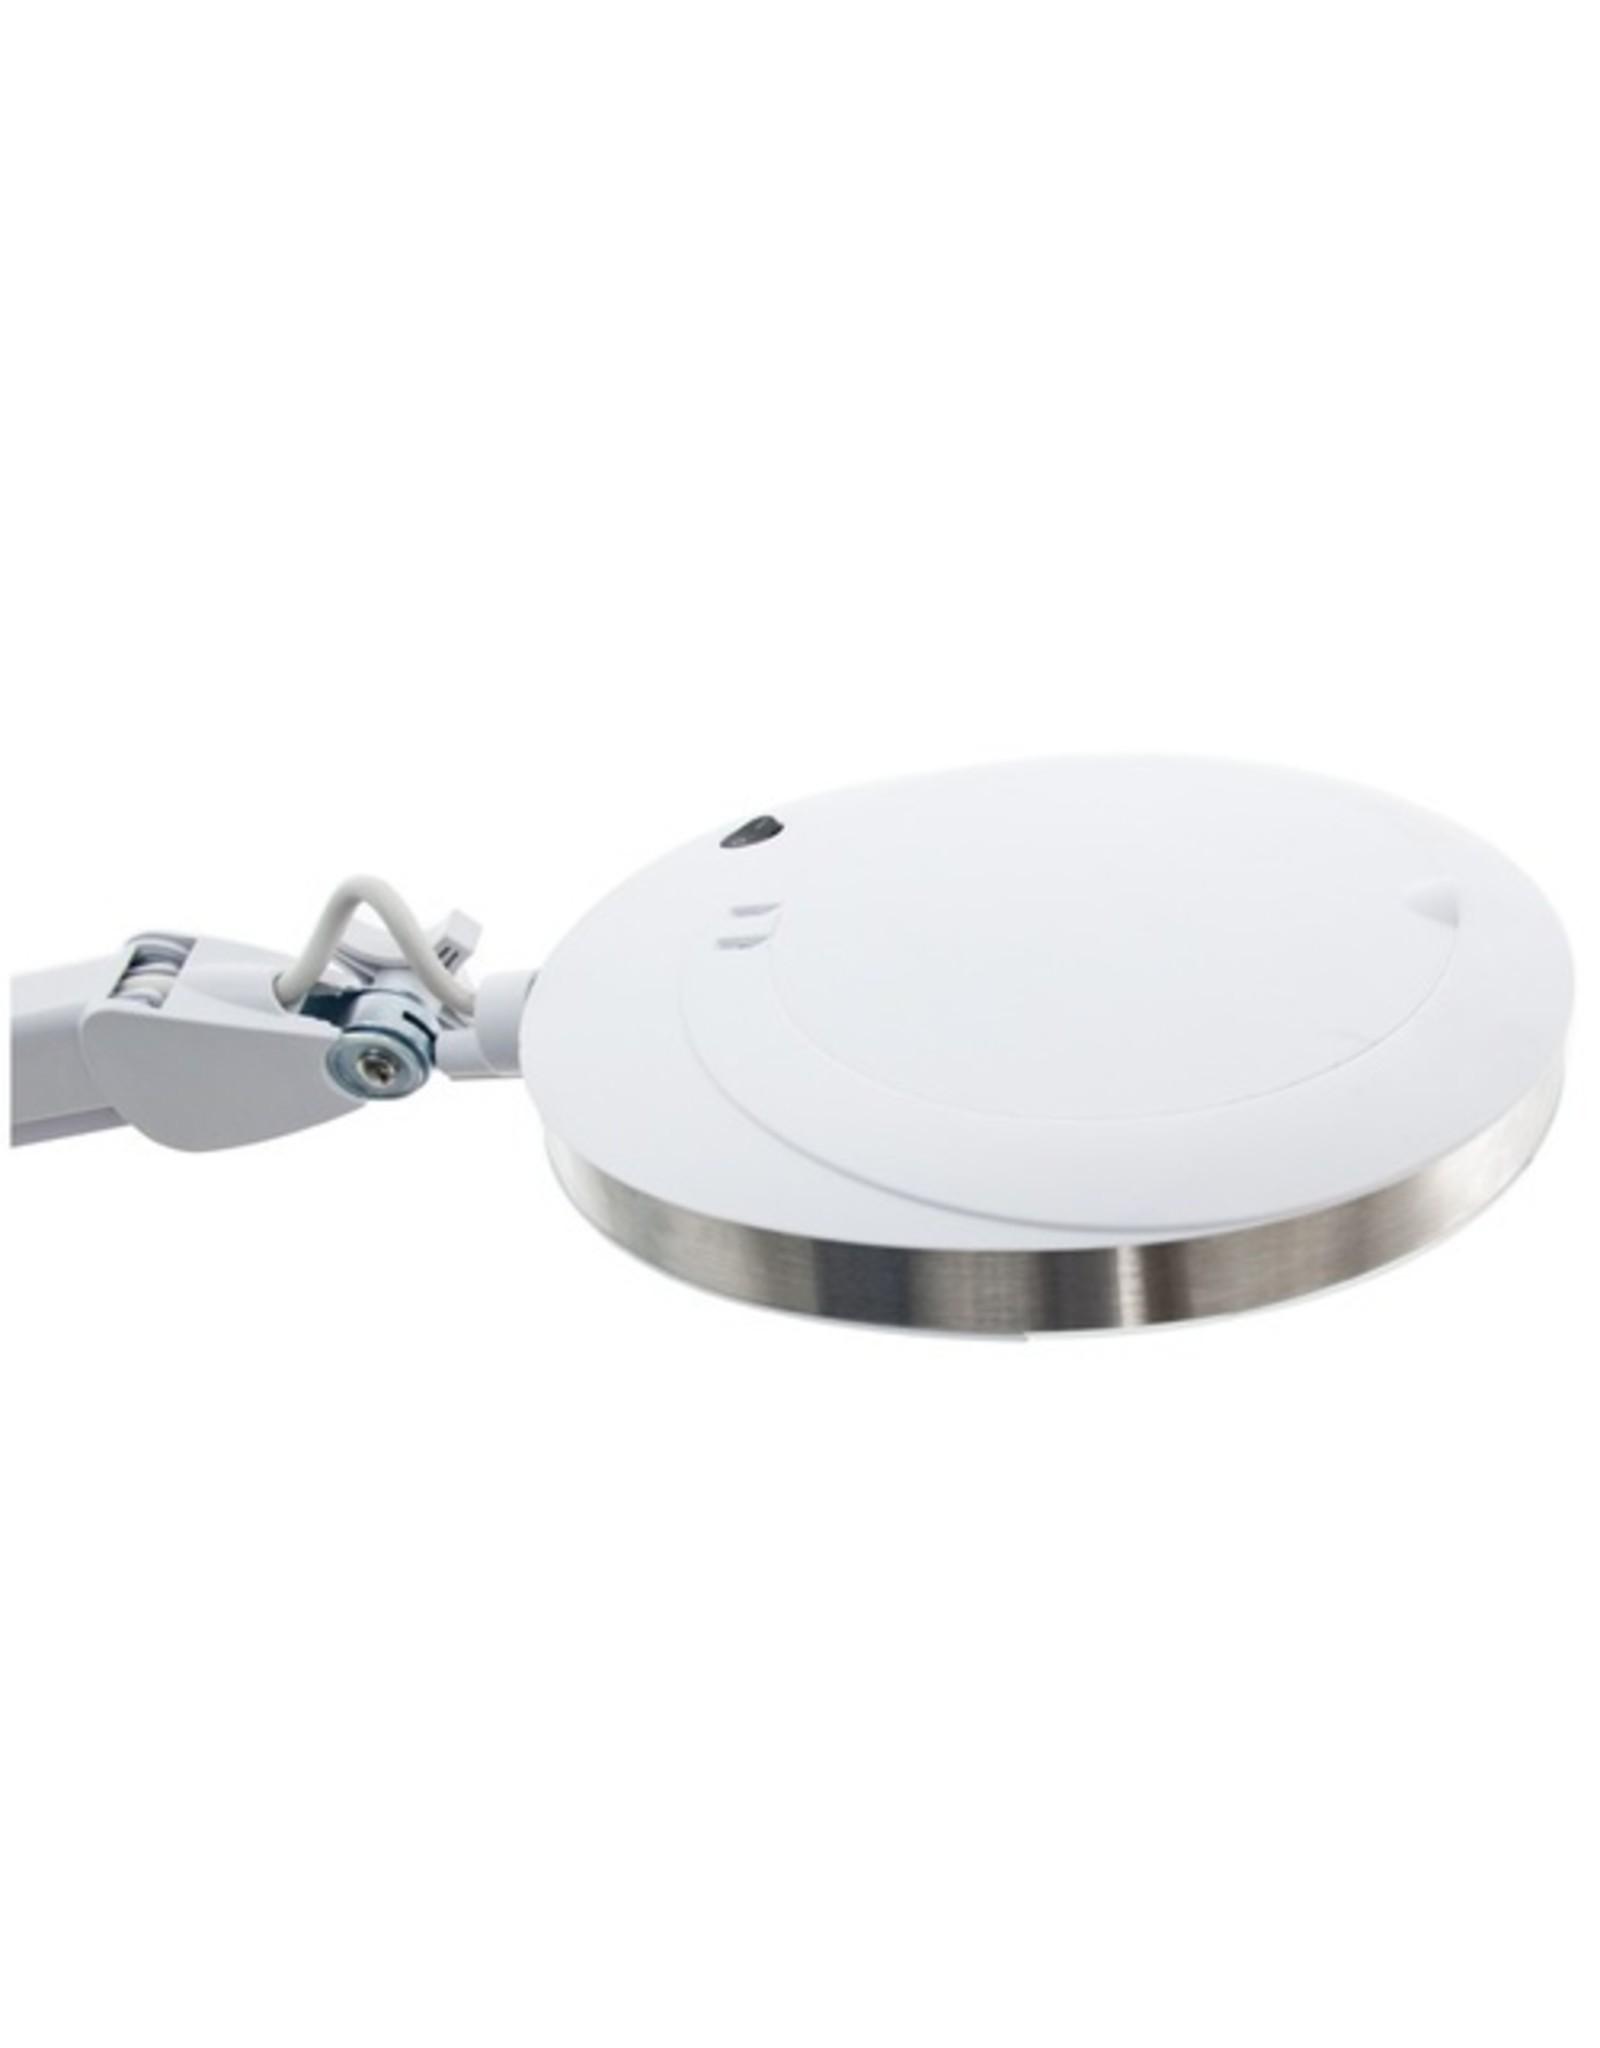 Mega Beauty Shop® Loeplamp 6025 LED voor tafelklem